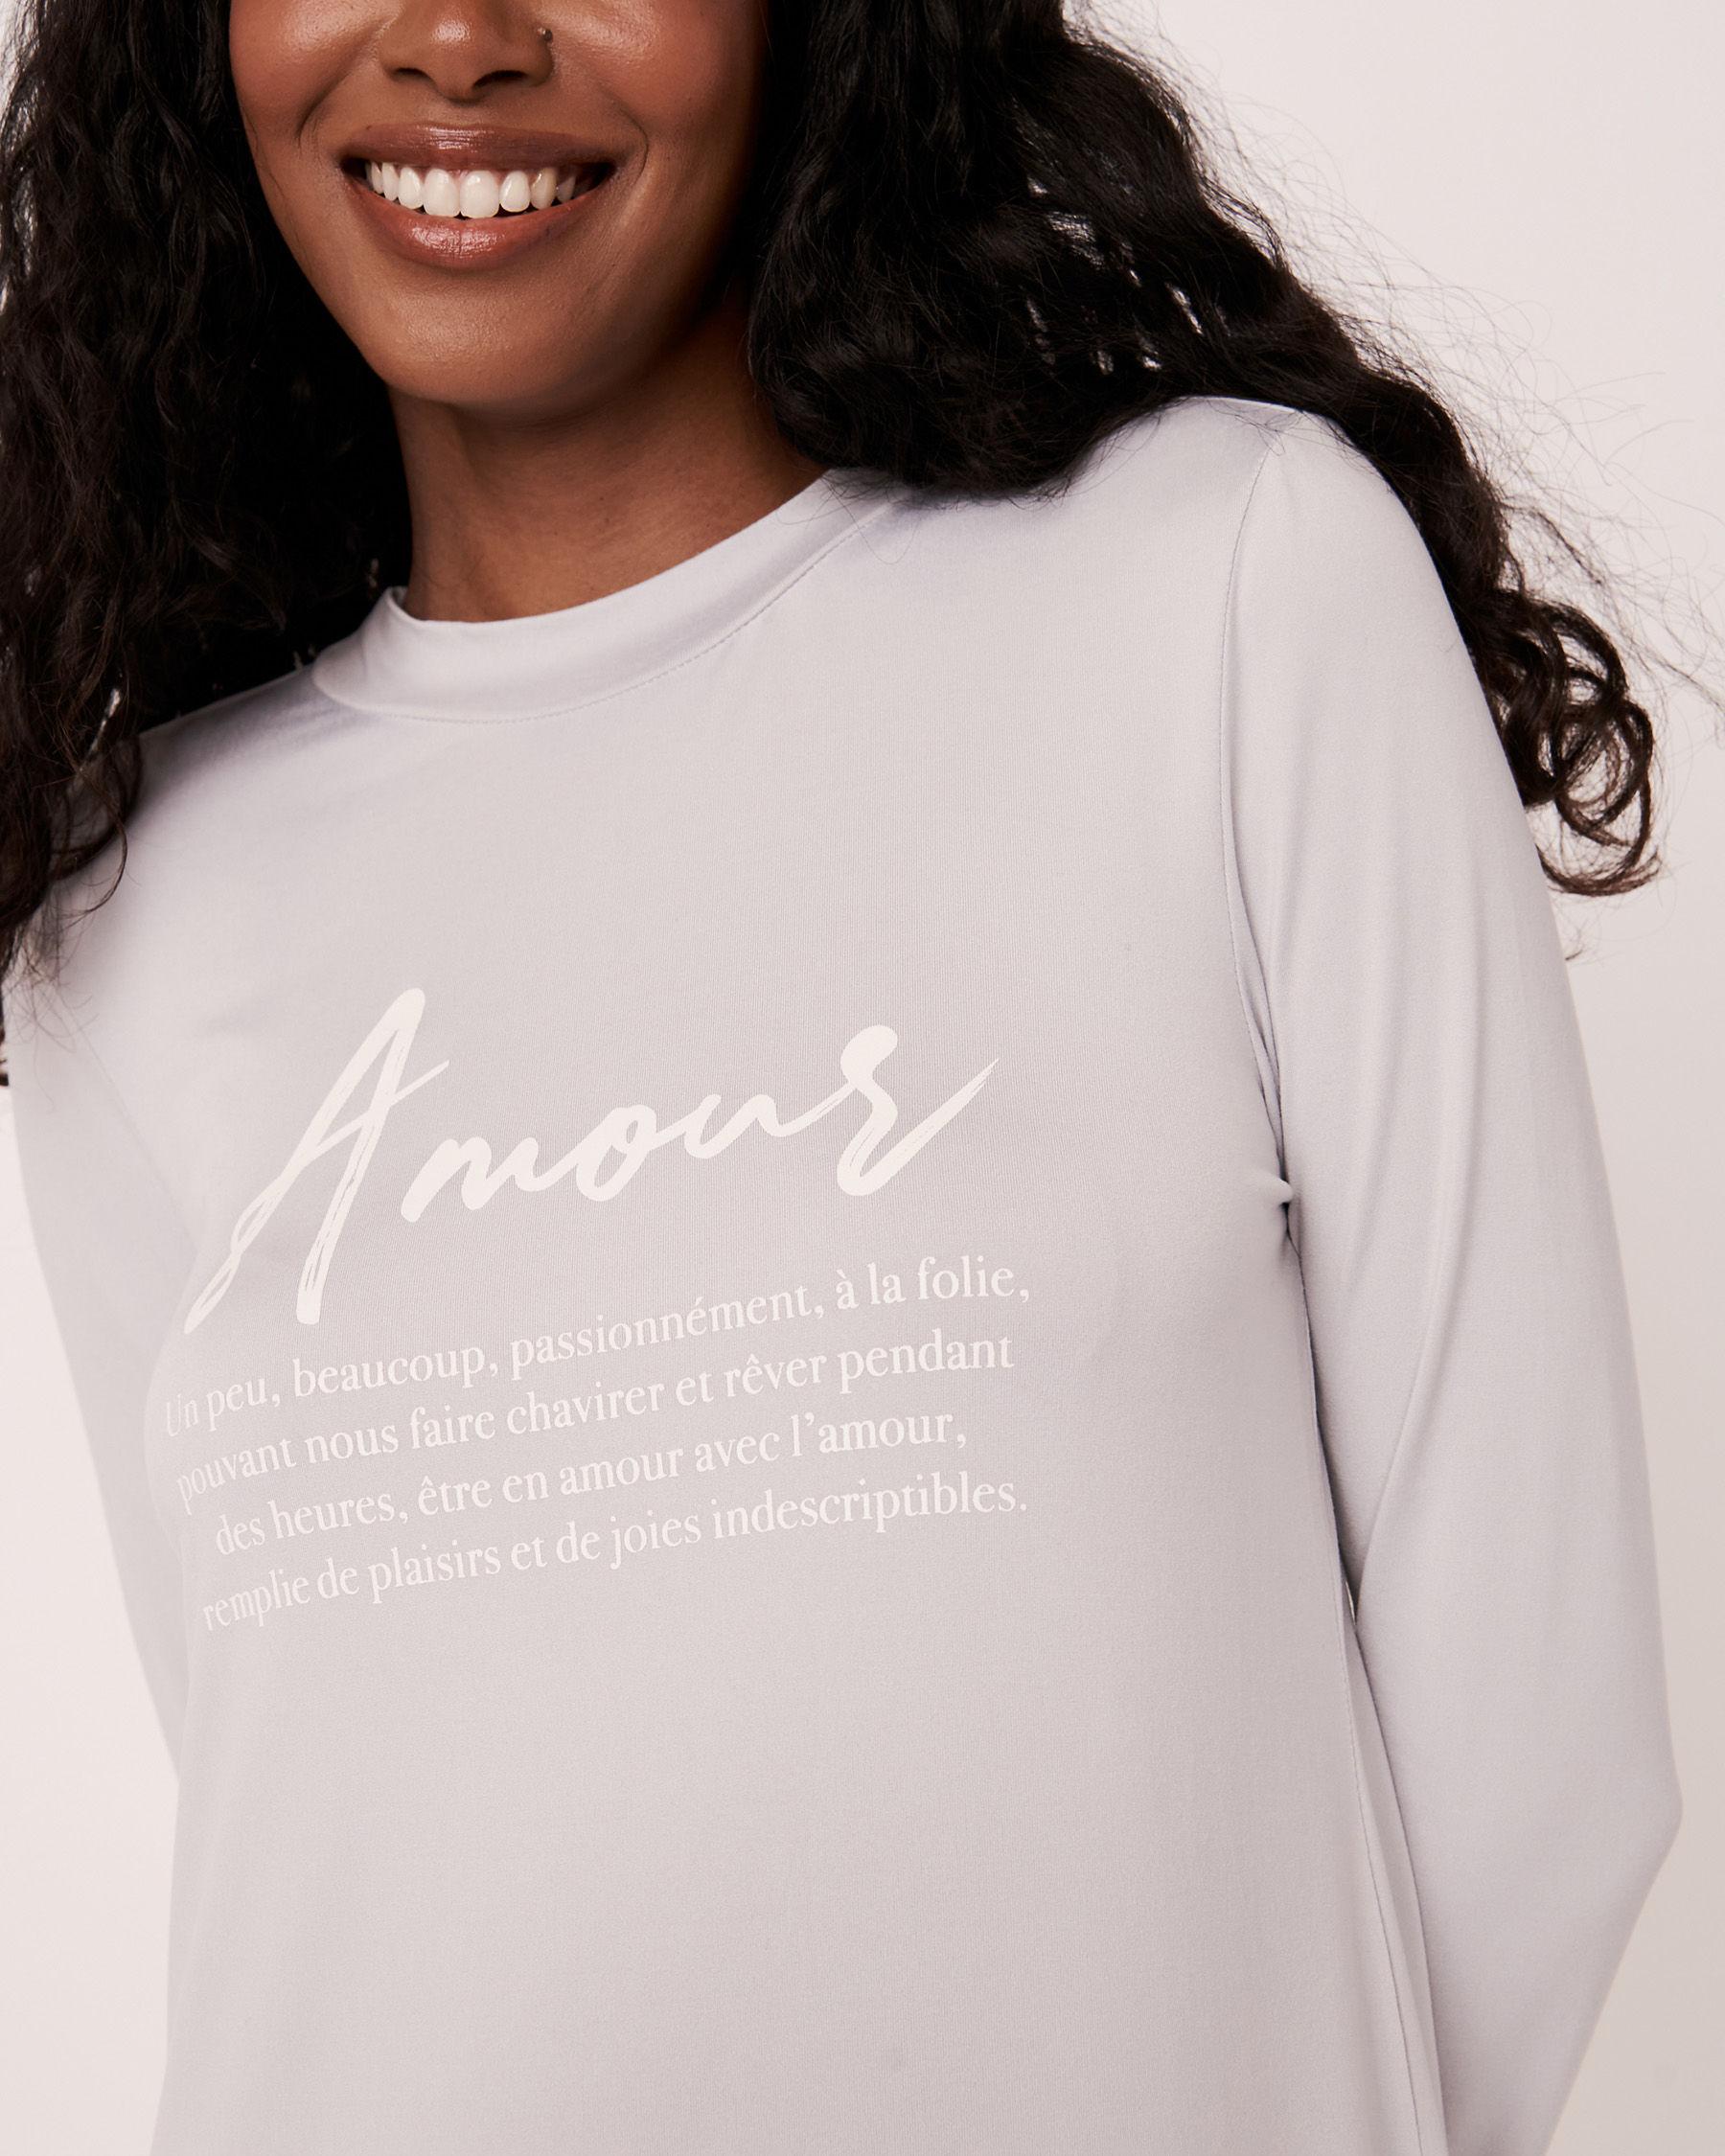 LA VIE EN ROSE High Neck Long Sleeve Sleepshirt Grey print 40500076 - View1